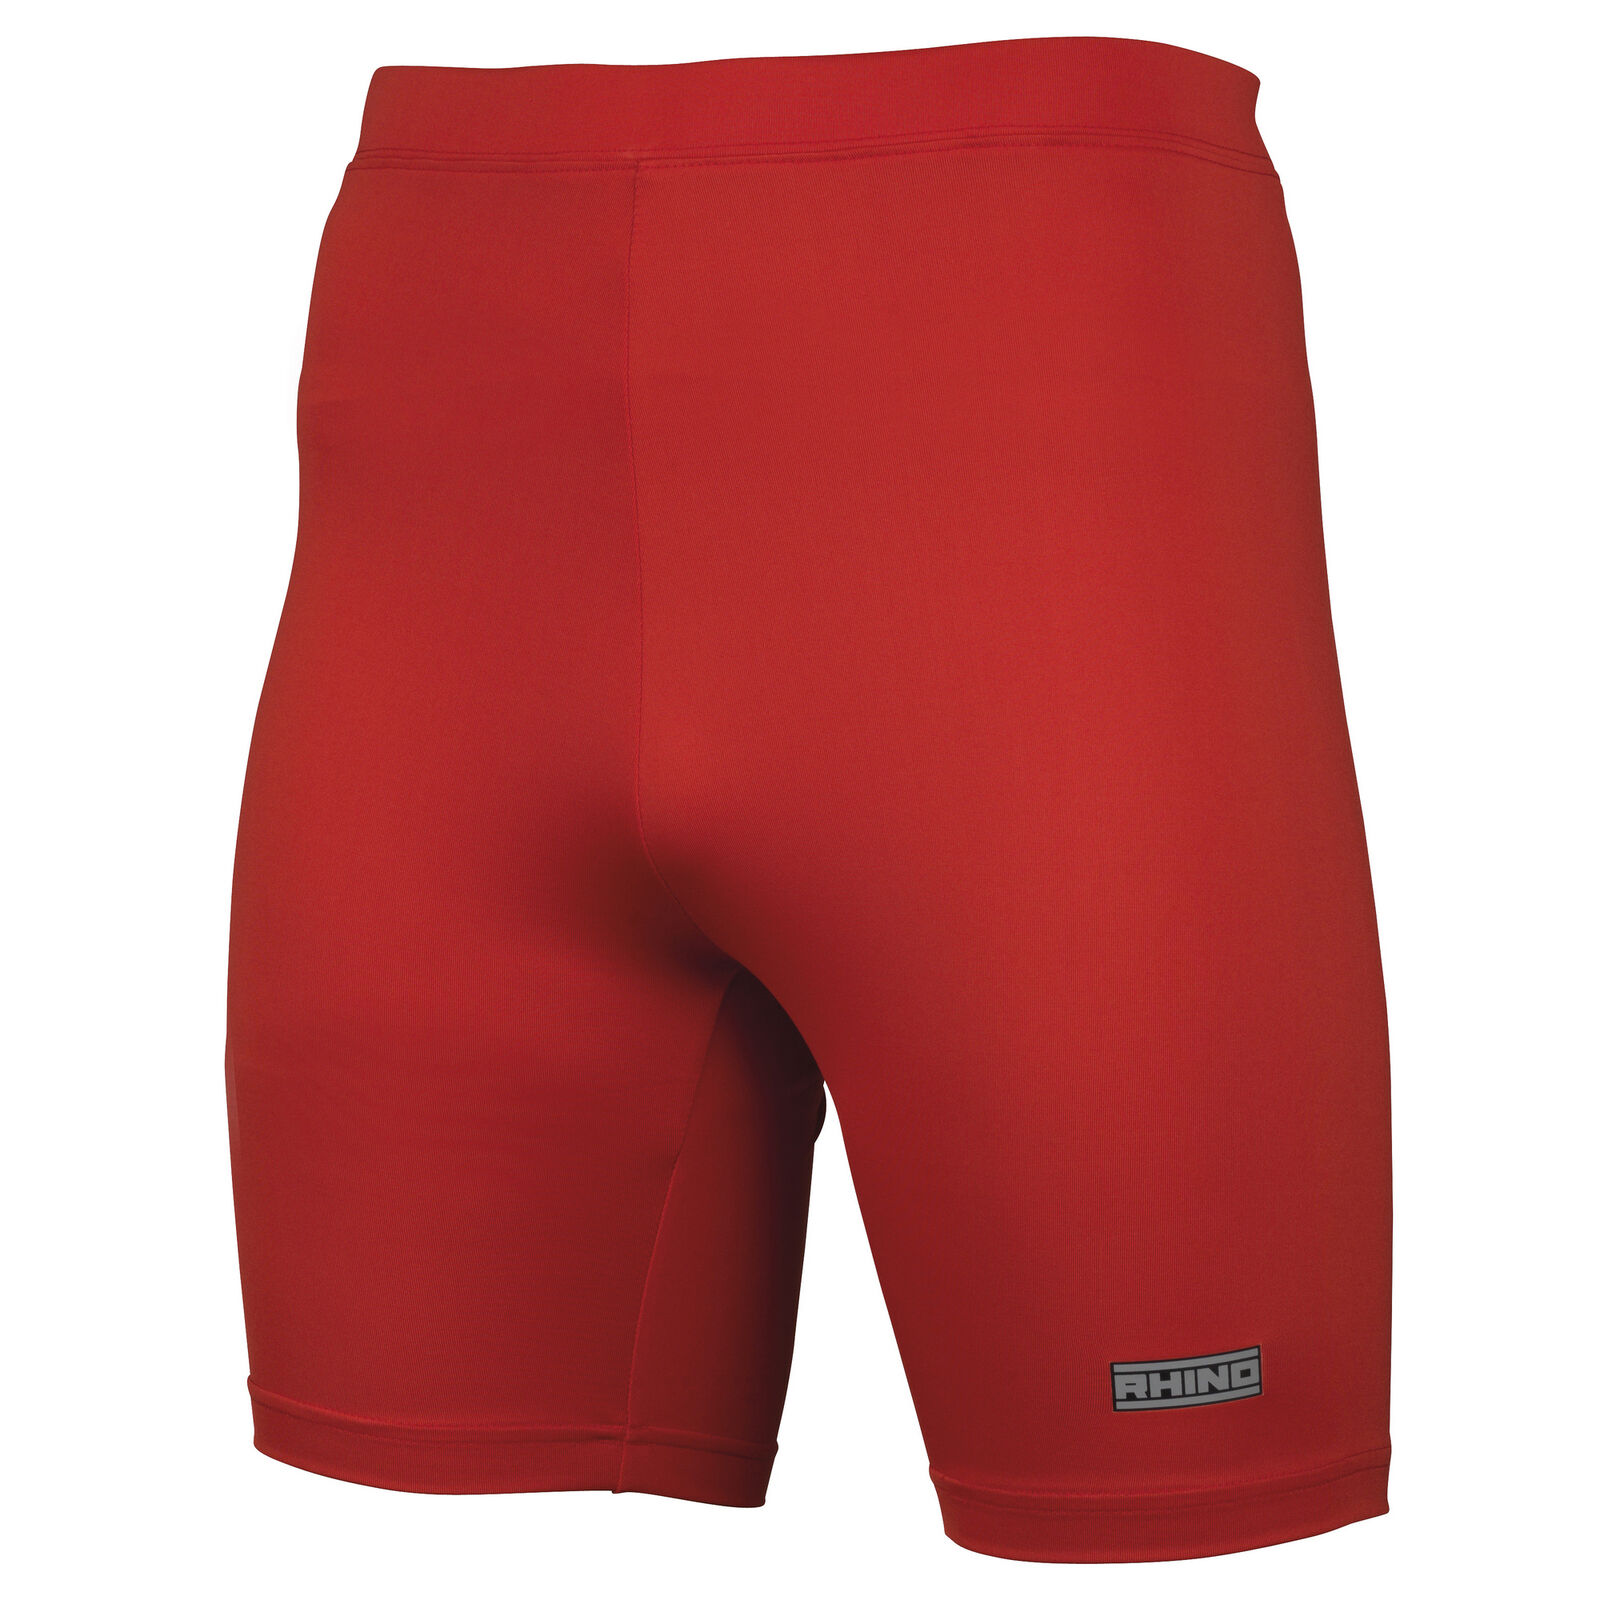 RW1278 Rhino Mens Sports Base Layer Cycle Shorts 14 Colours Sizes XS-2XL